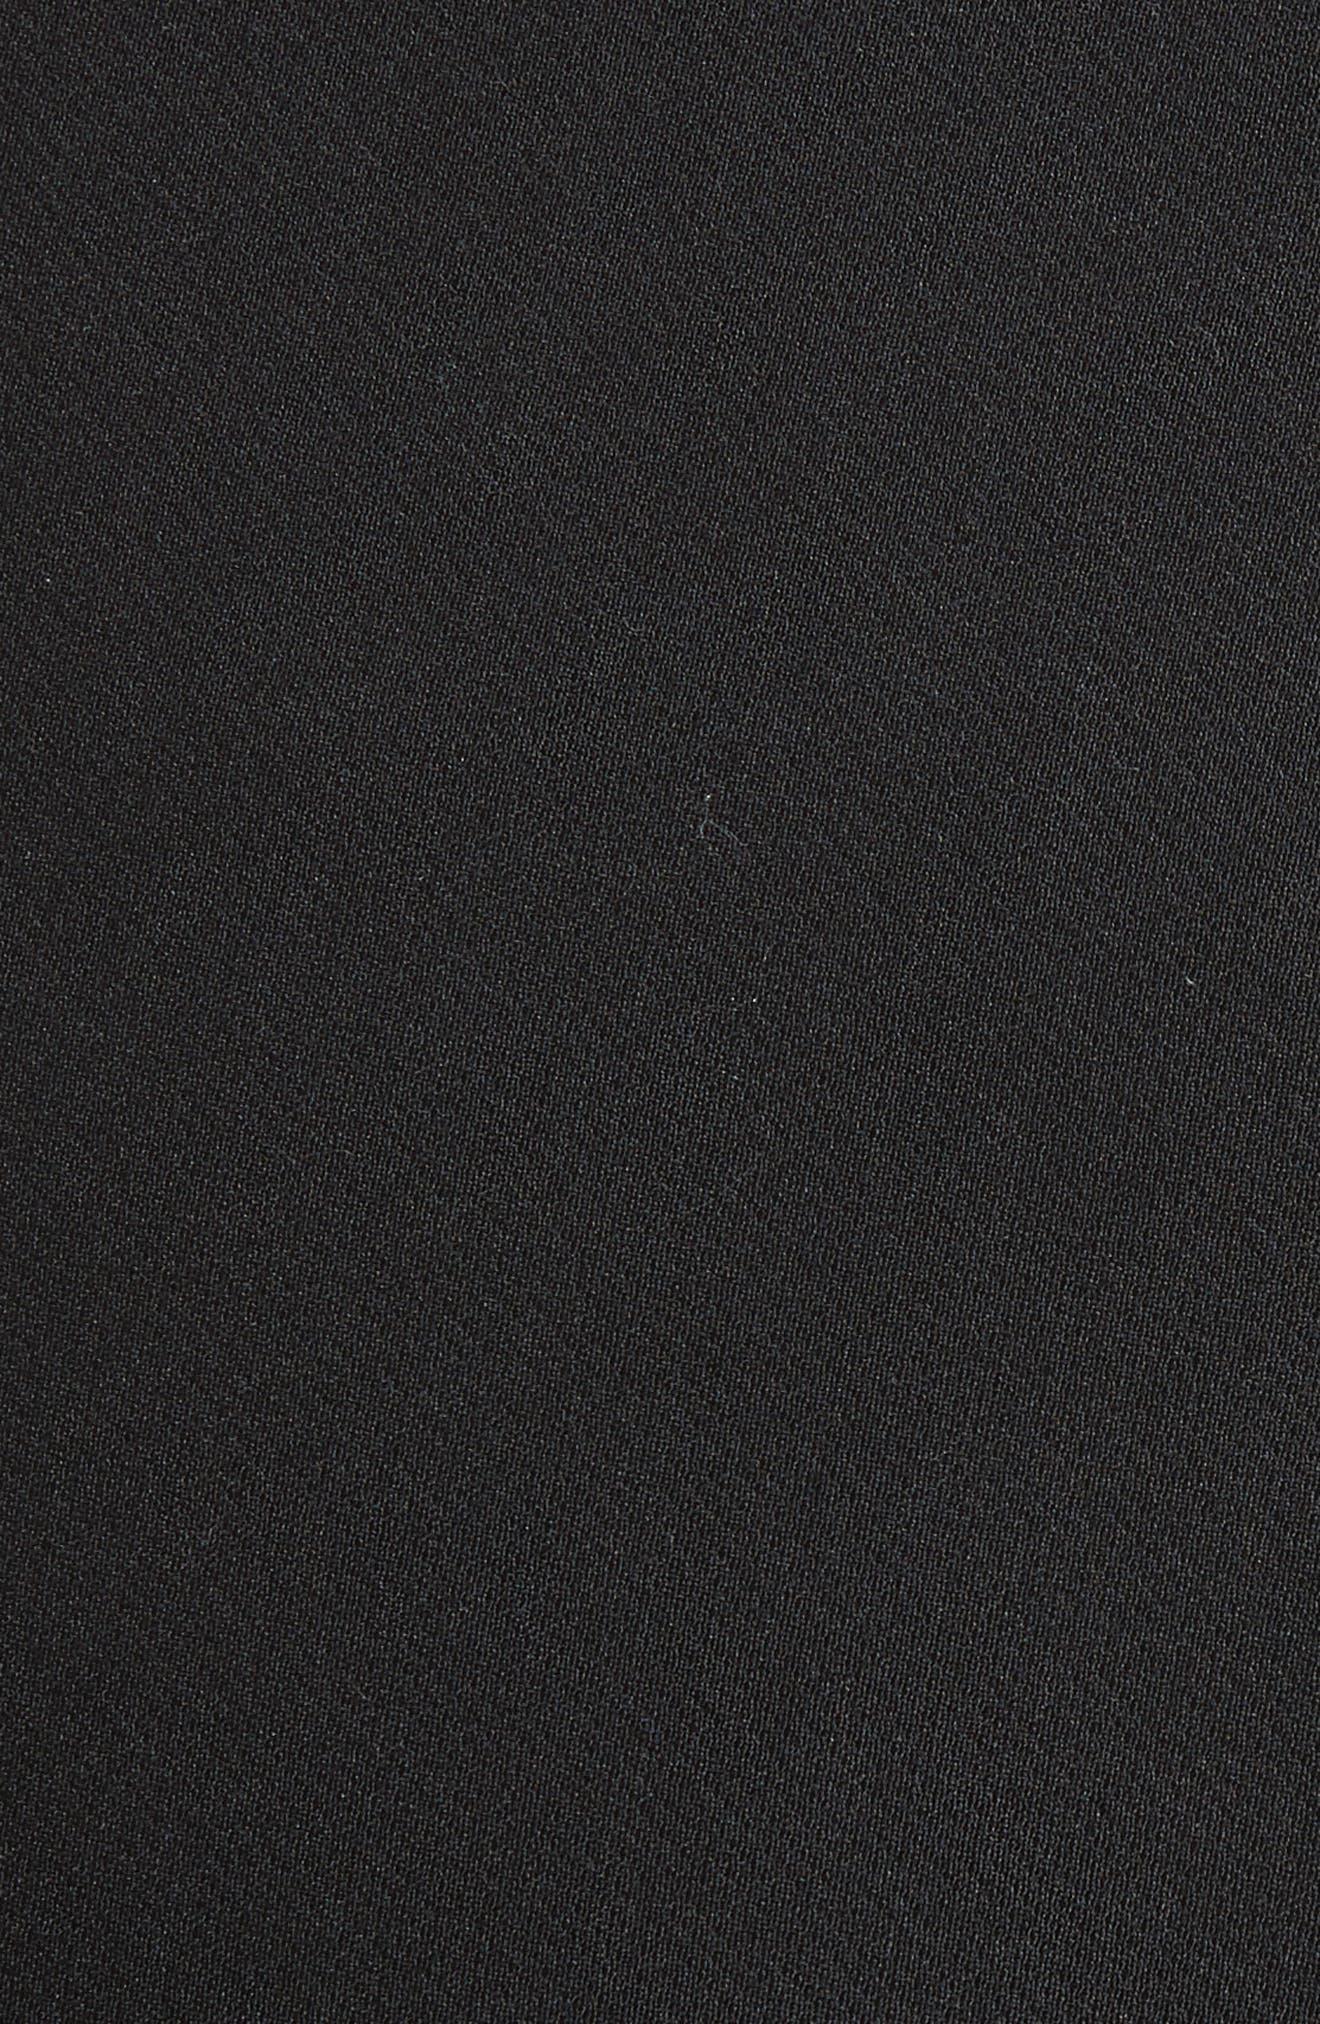 Faux Leather Stretch Leggings,                             Alternate thumbnail 5, color,                             001